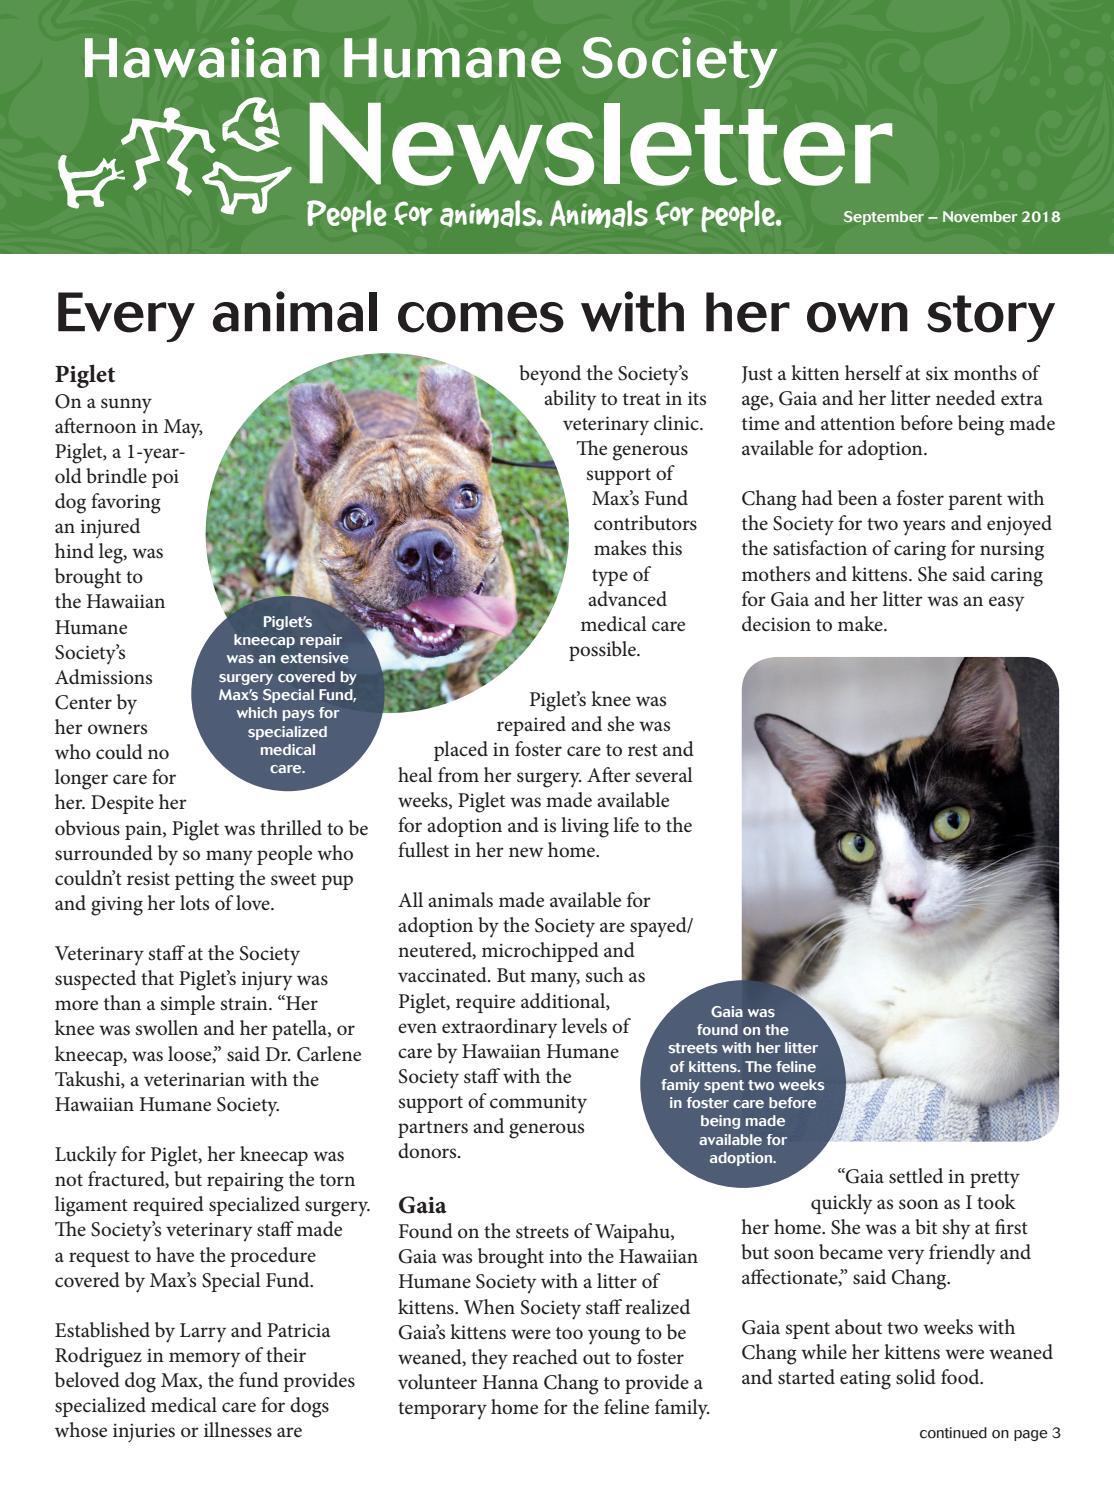 Hawaiian Humane Society September 2018 Newsletter by